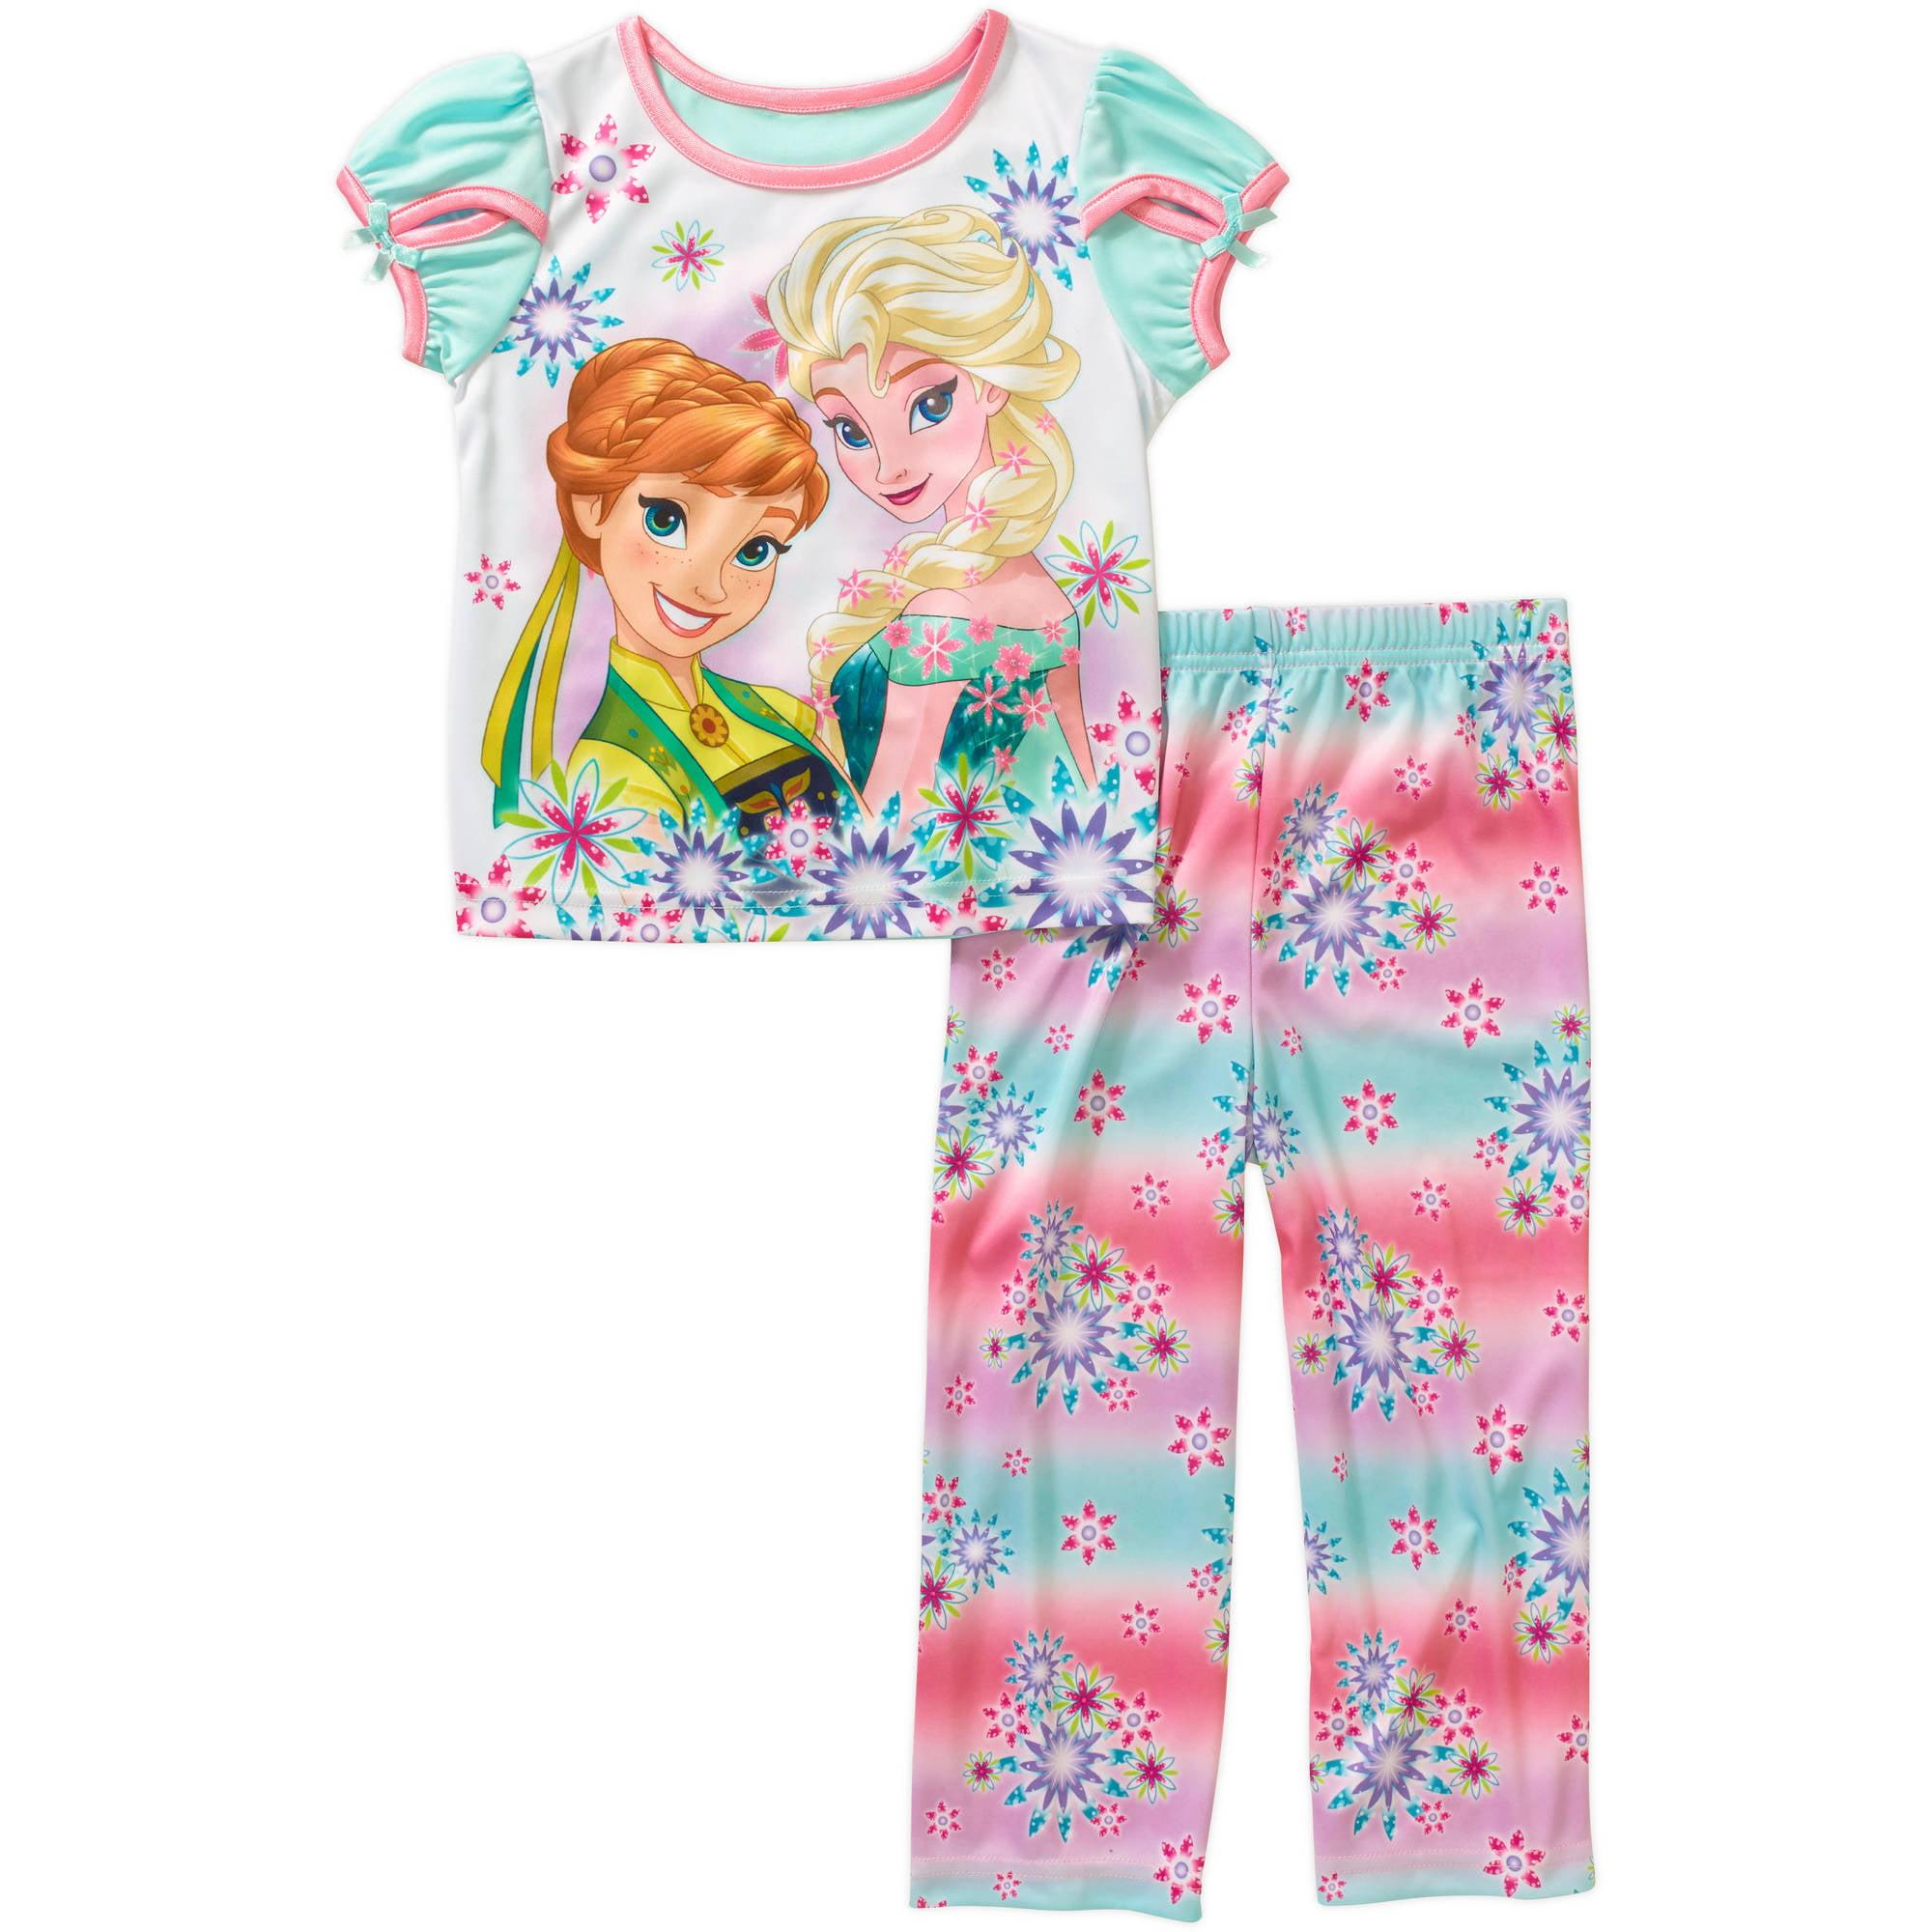 Disney Frozen Toddler Girl Short Sleeve Pajama Sleepwear Set